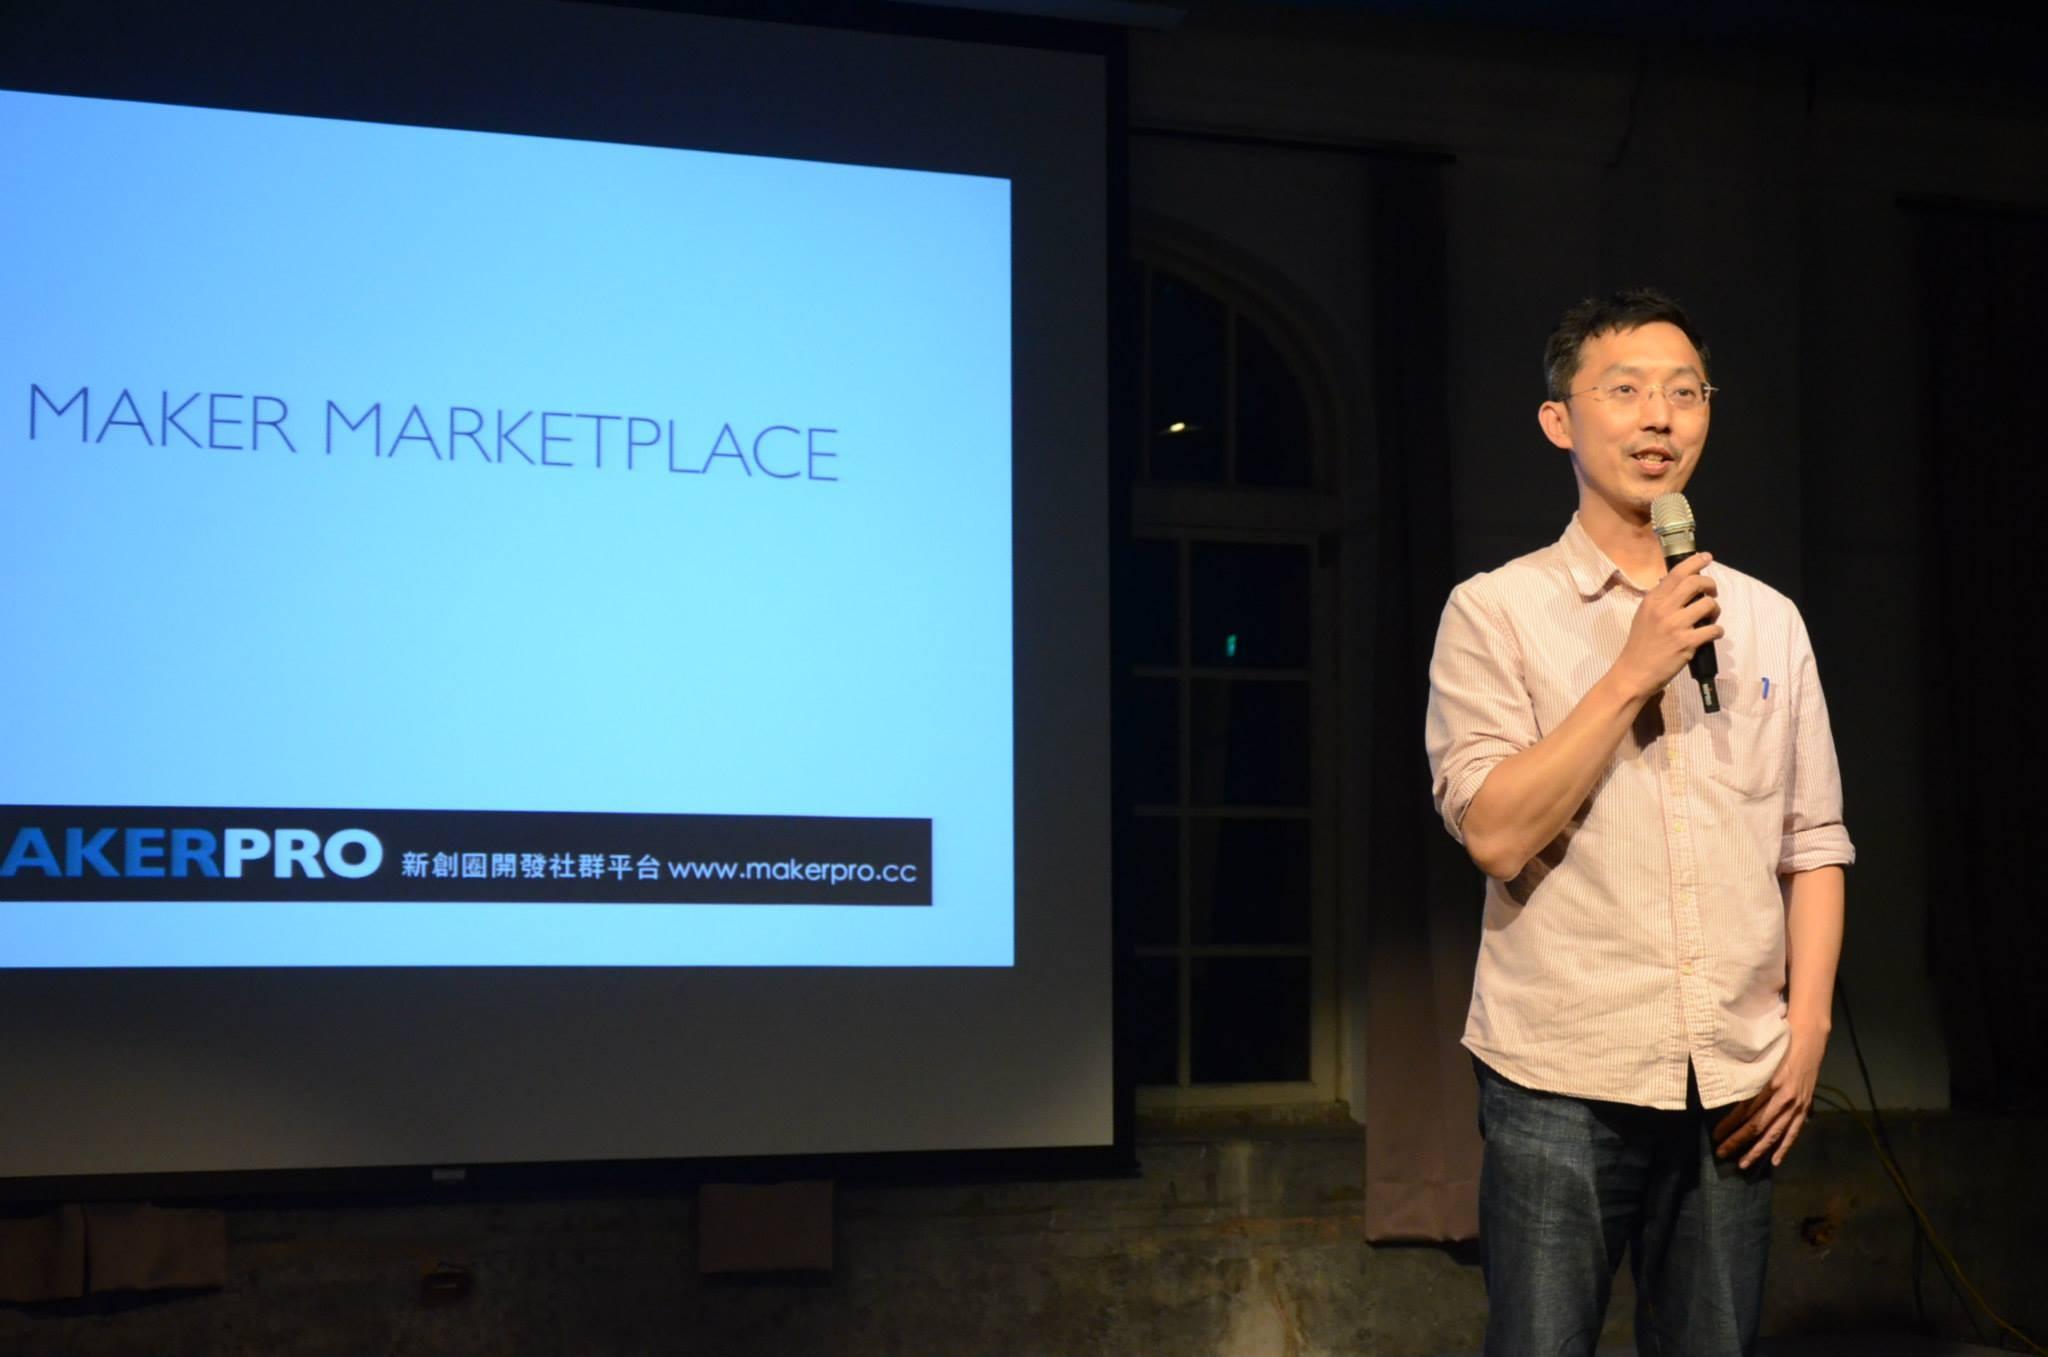 Makerpro總主筆歐敏銓指出,Maker市集不只是販賣產品,更重要的是必須與社群有所連結。